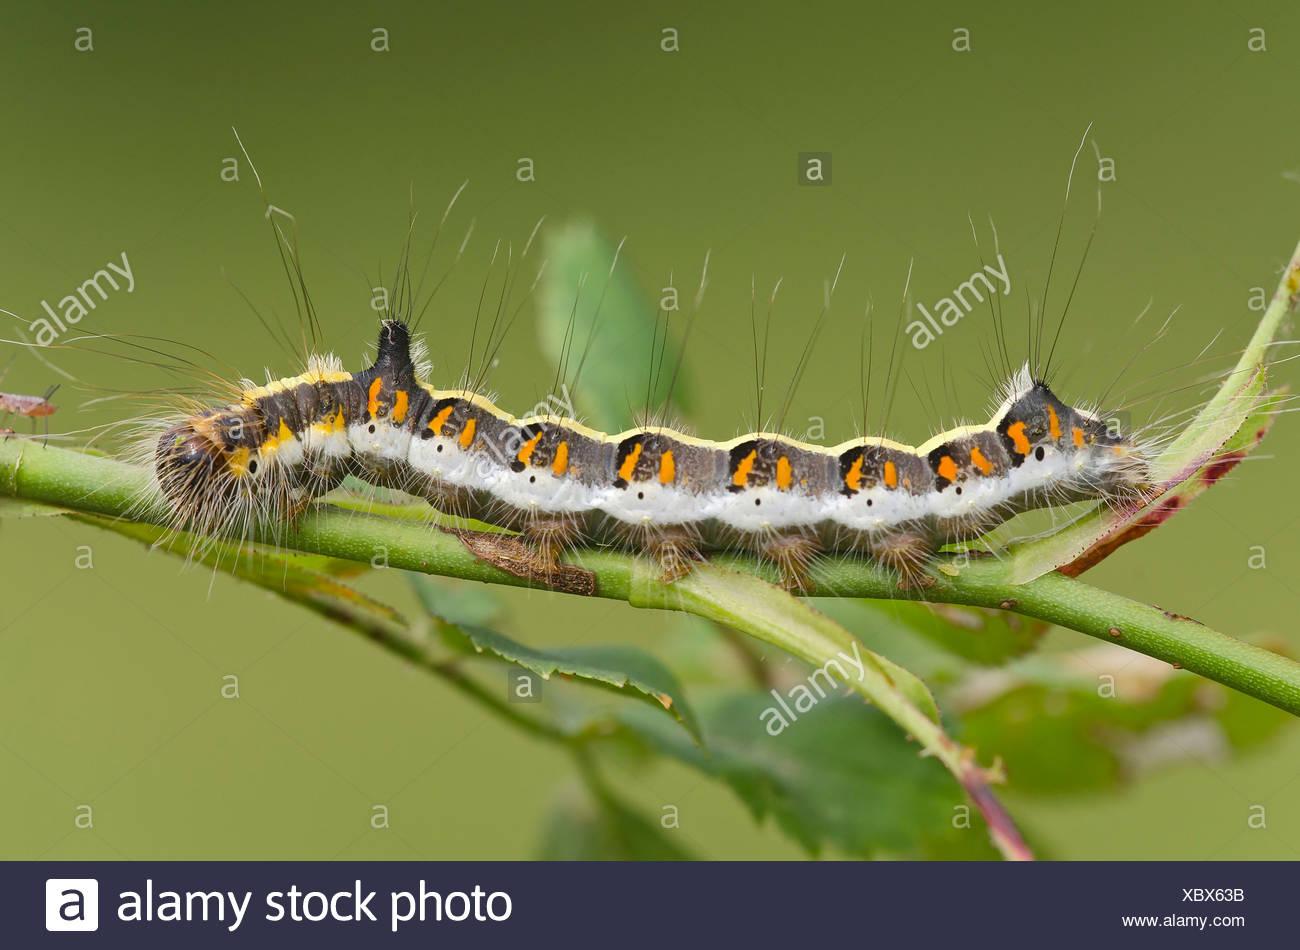 Caterpillar of a Grey Dagger Moth (Acronicta psi), Burgenland, Austria - Stock Image